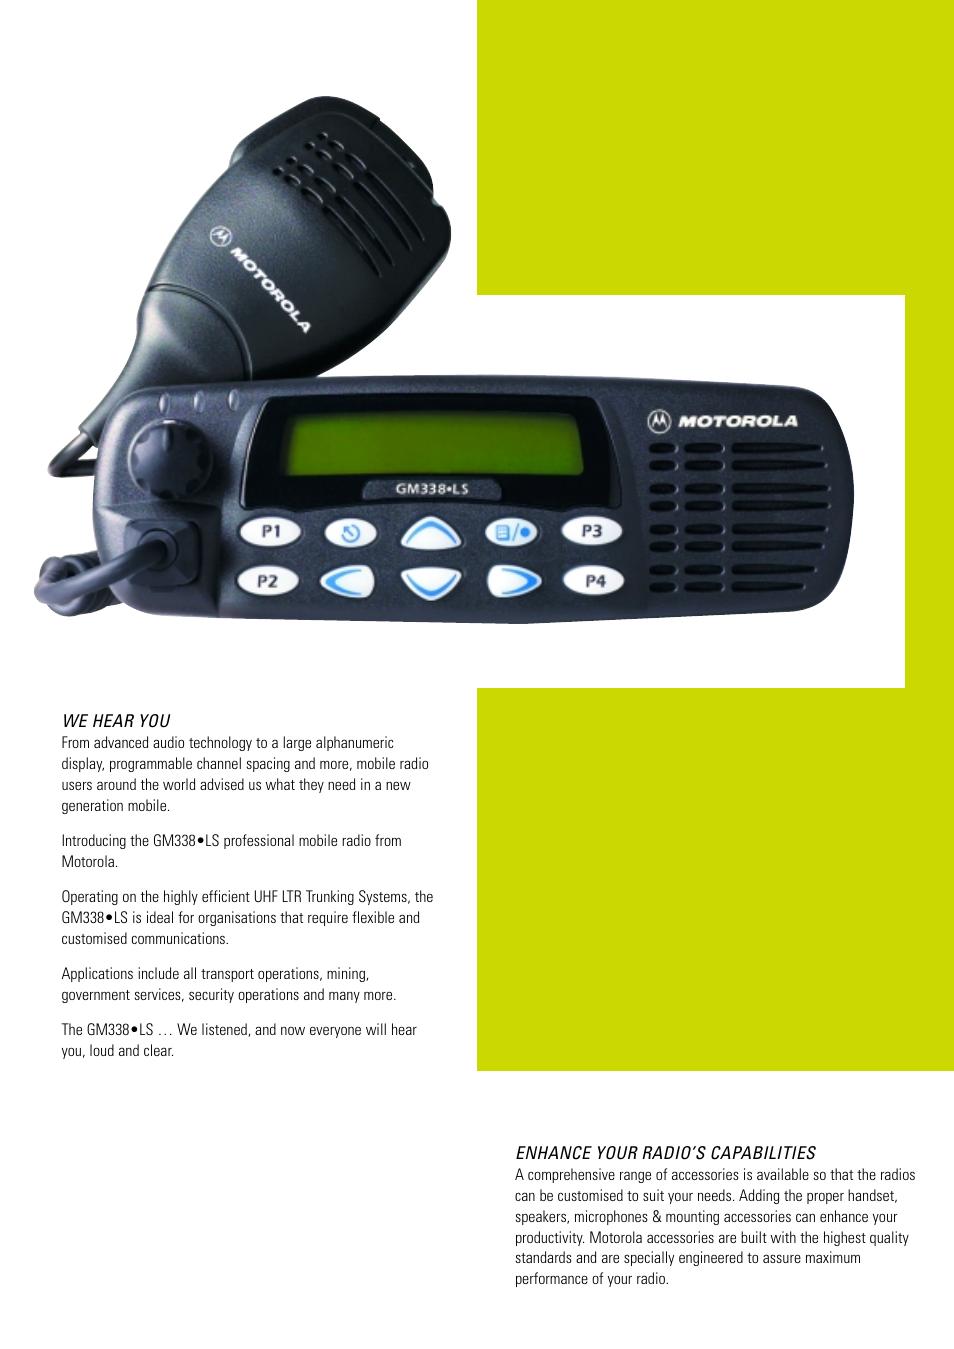 motorola professional mobile radio gm338ls user manual page 2 4 rh manualsdir com motorola gm338 user guide pdf motorola gm338 user manual pdf